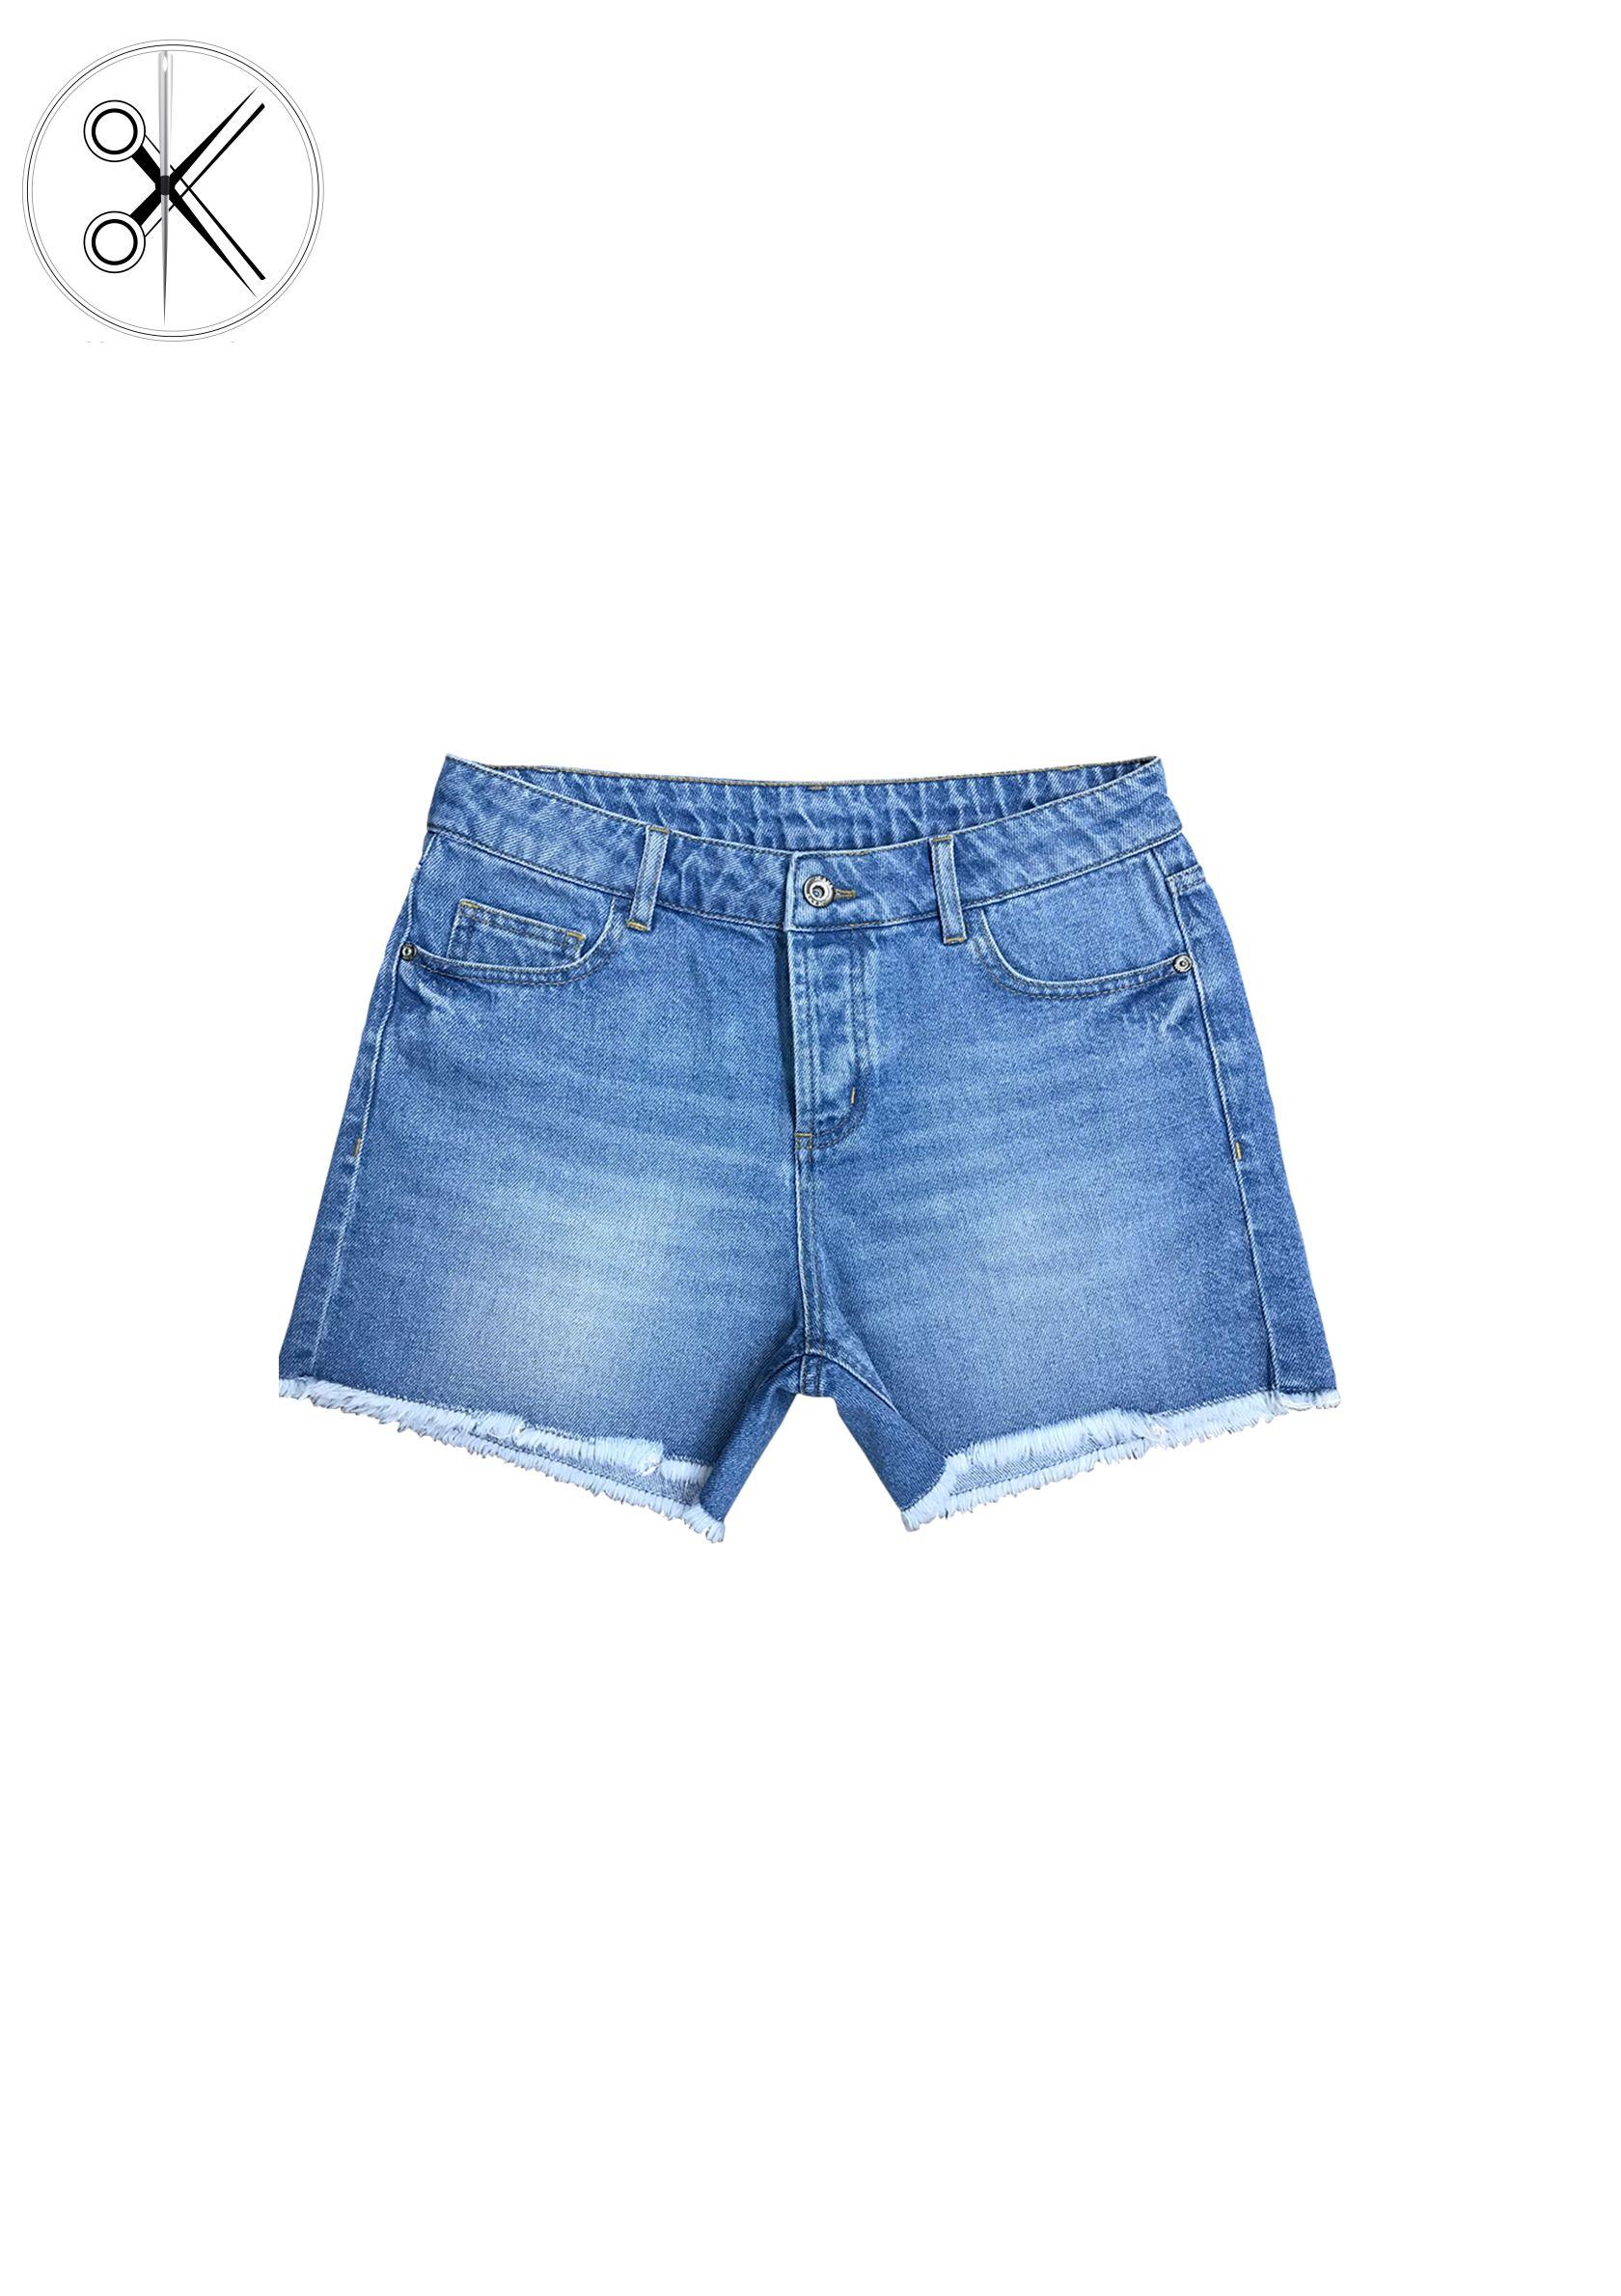 New Fashion Women's Jean Shorts